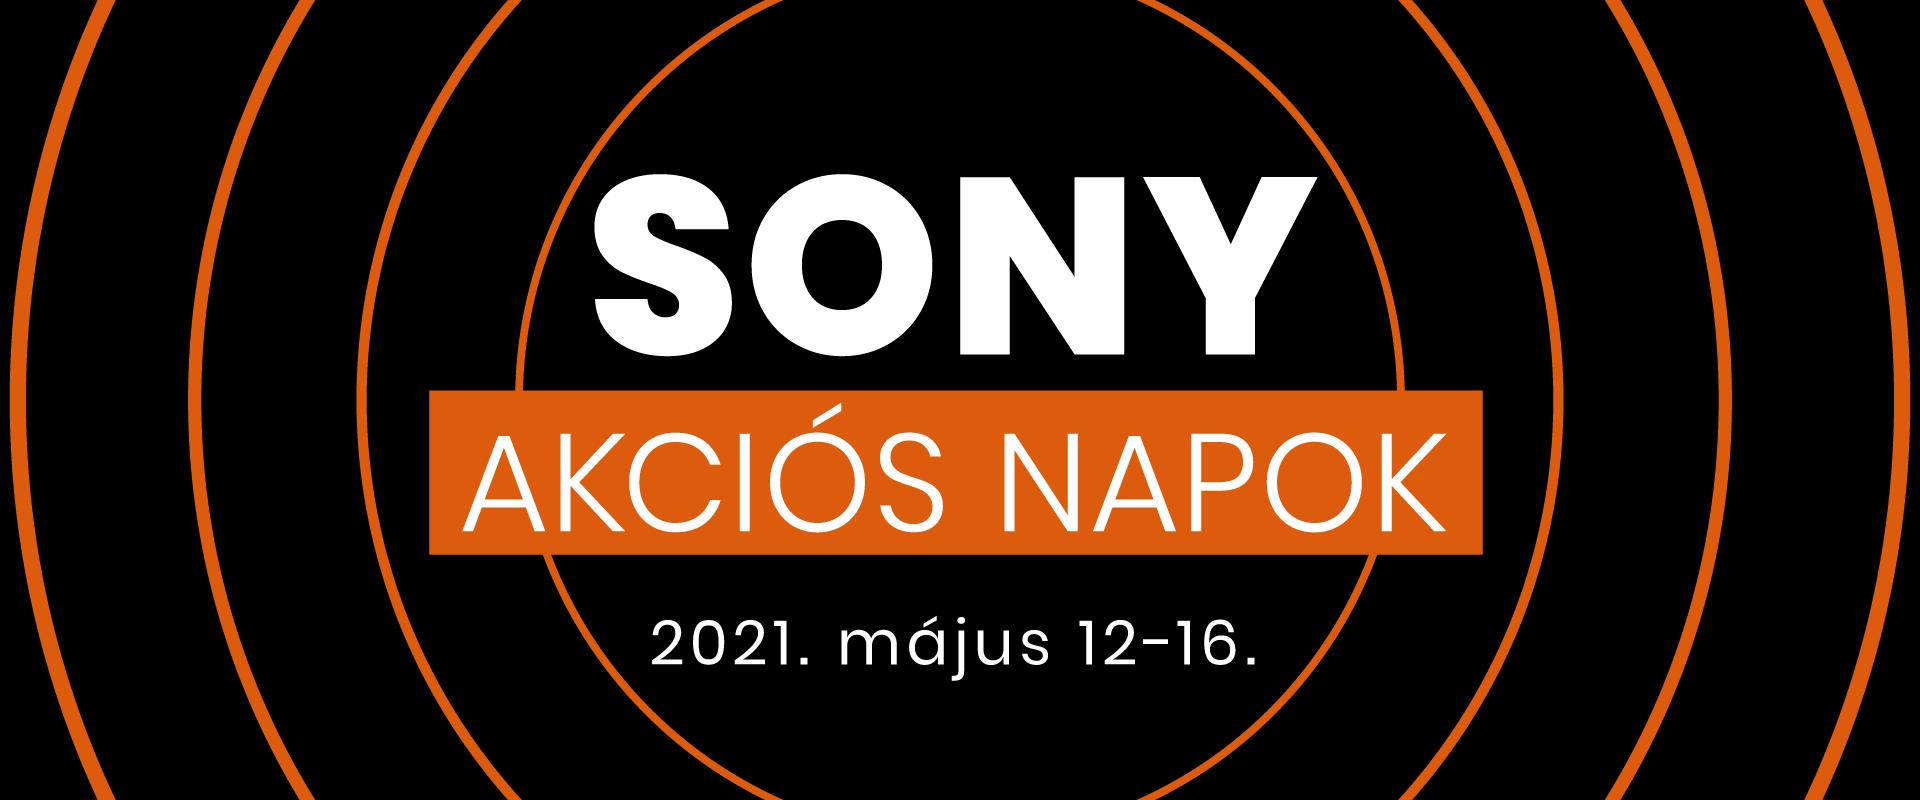 Sony akciós napok!